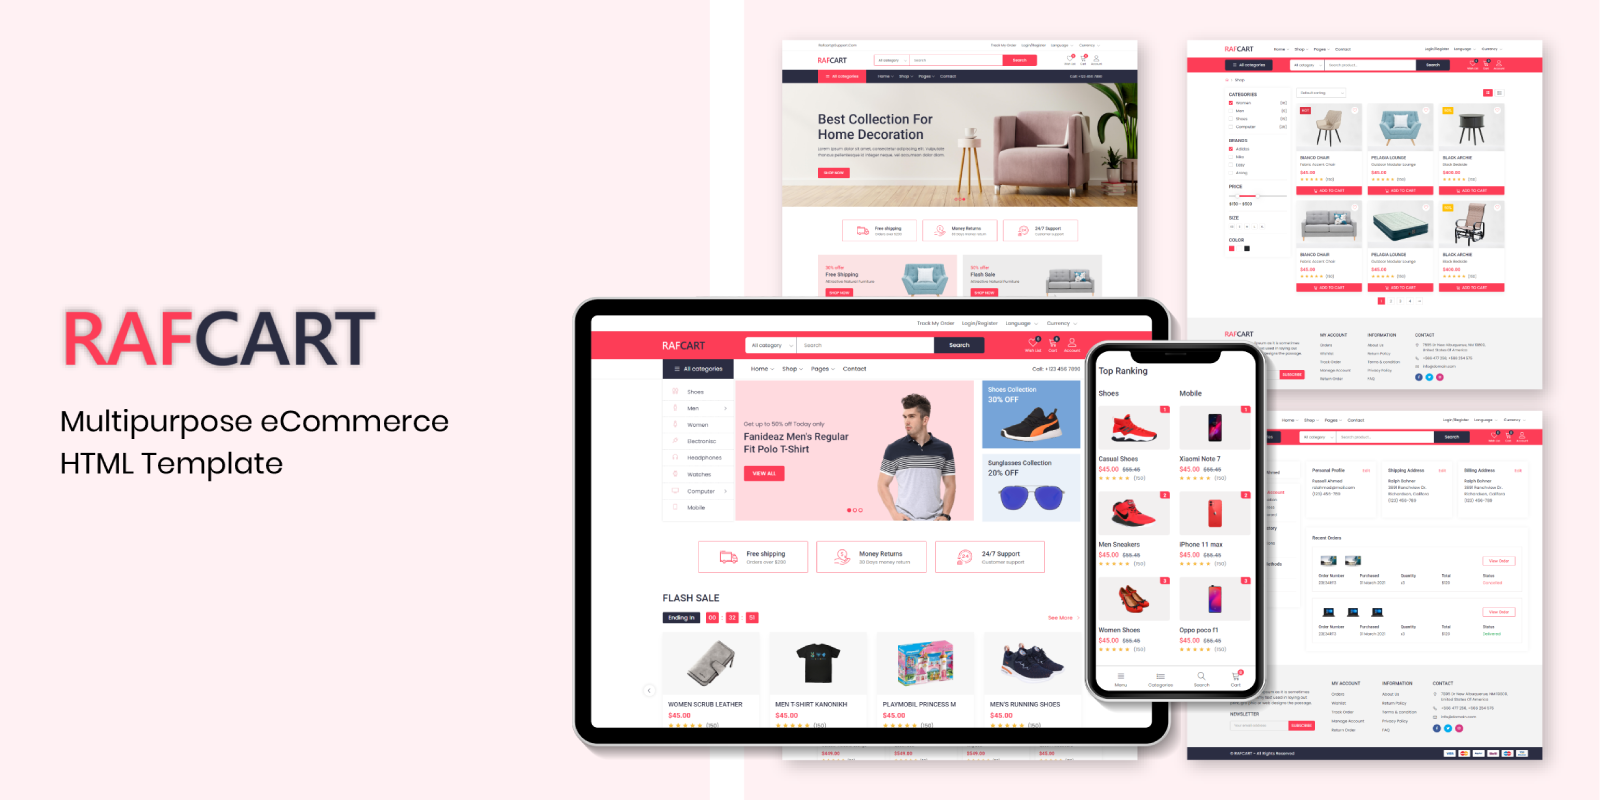 RafCart - Multipurpose eCommerce Bootstrap5 HTML Template